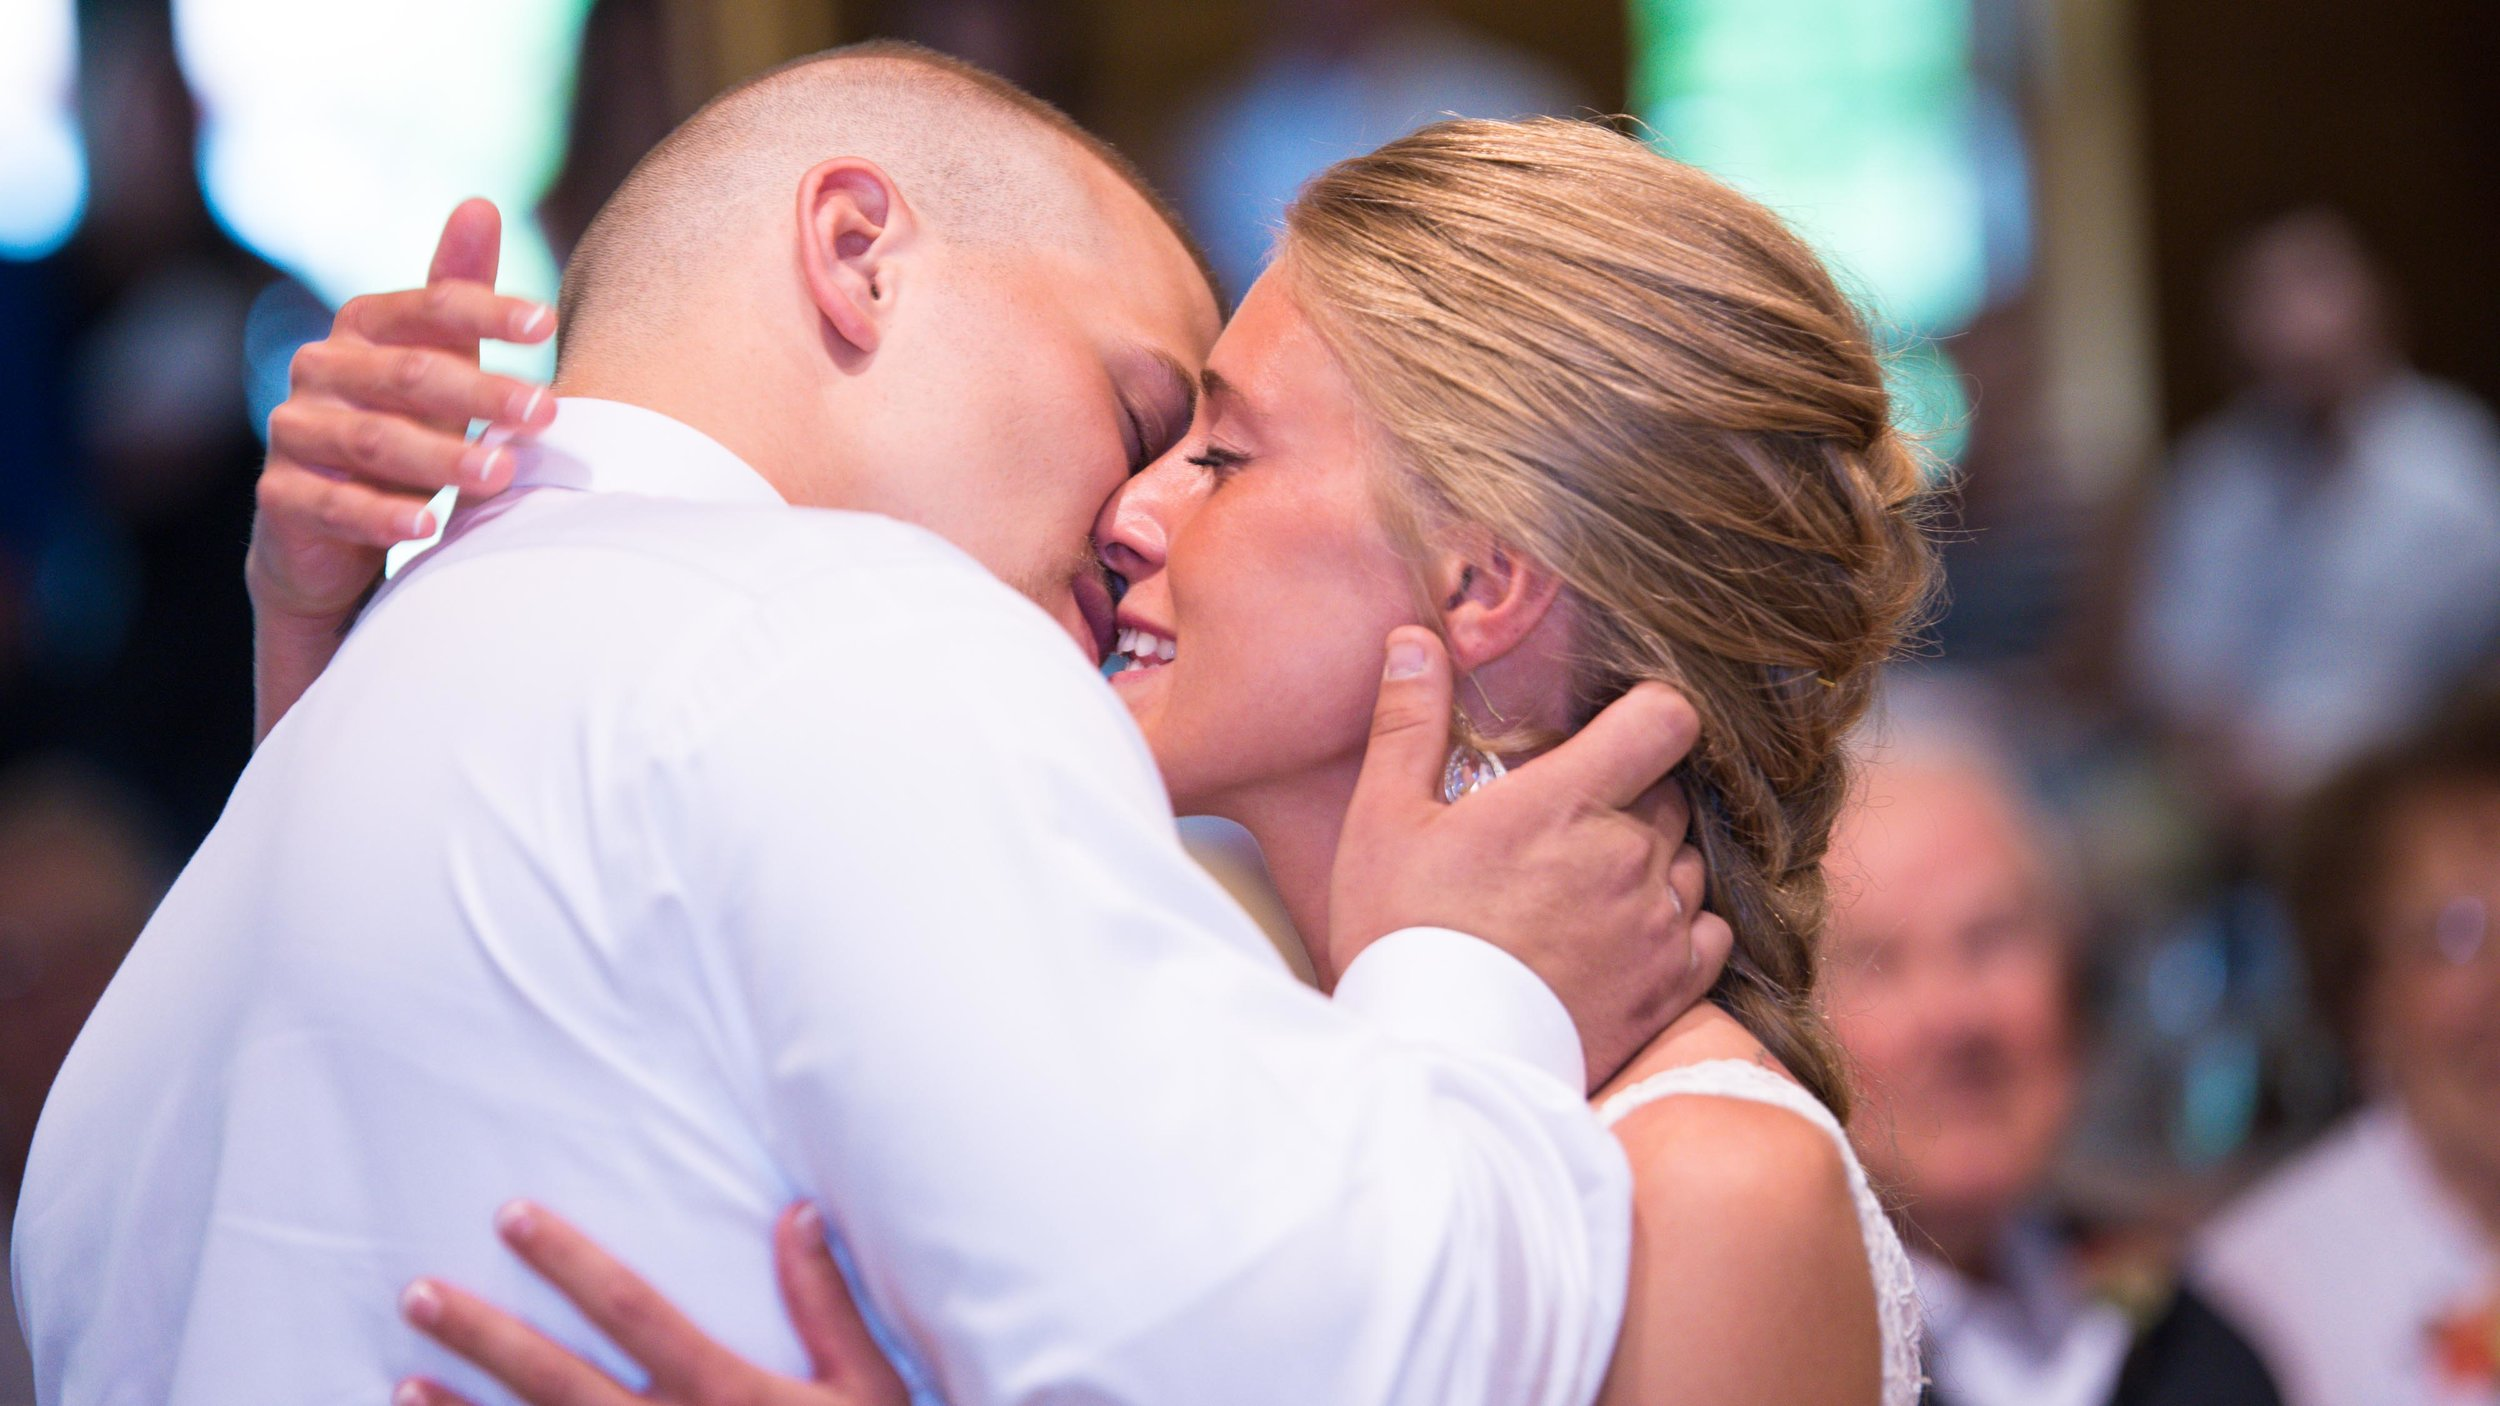 Bride-and-groom-first-kiss-mayernik-center-1.jpg